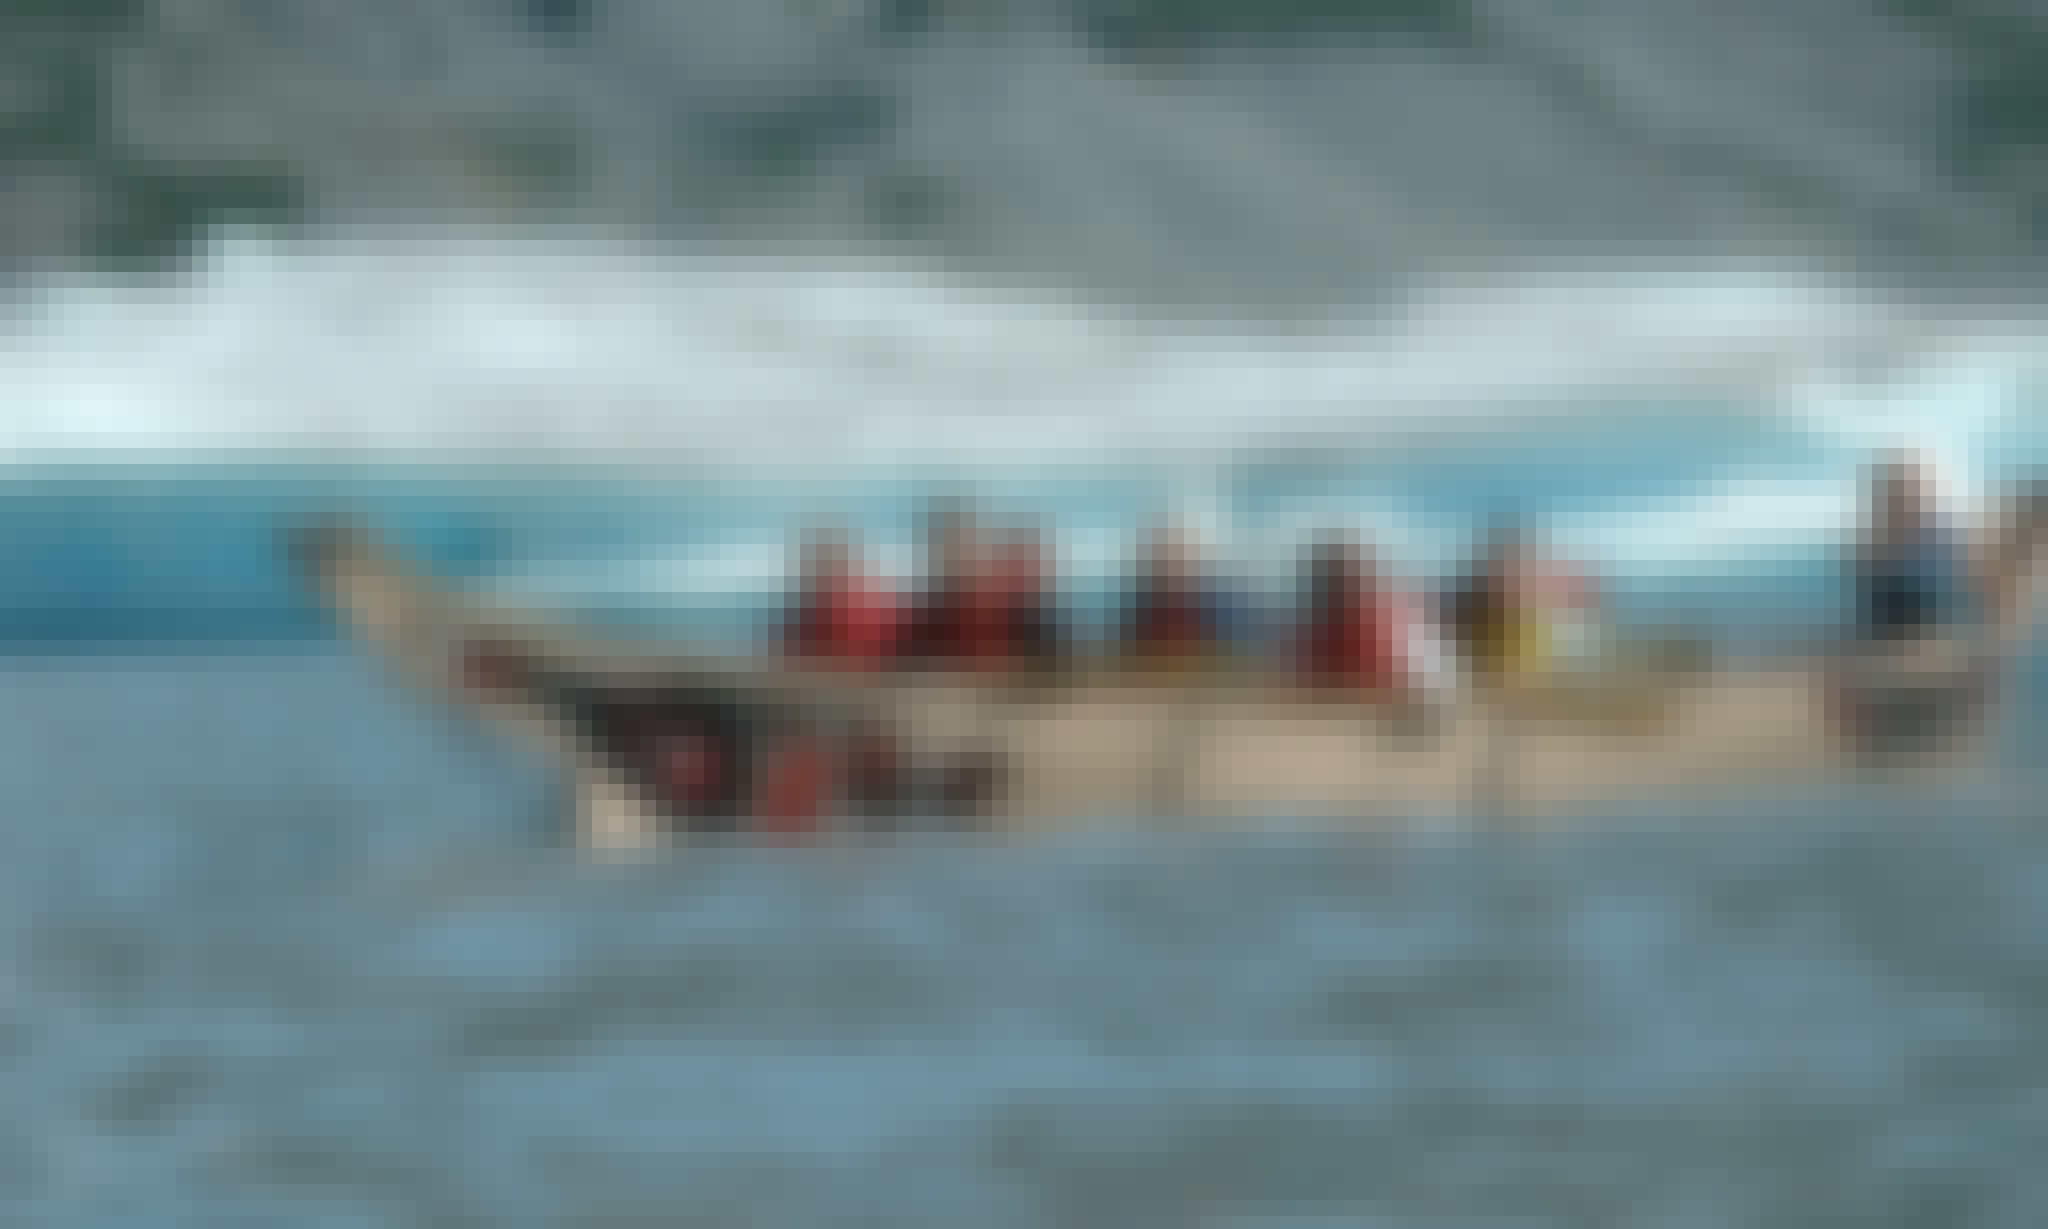 Sightseeing Paddle Lake Tour in Anchorage